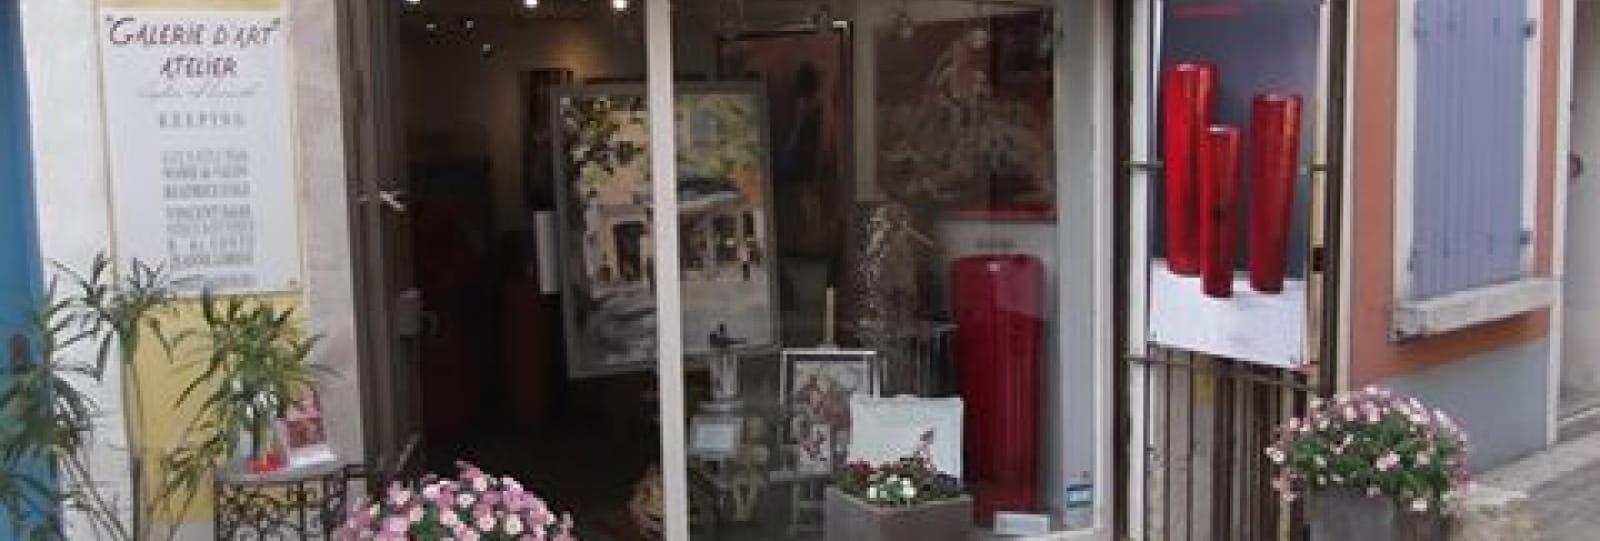 Galerie d'Art - Atelier Sophie Herrent